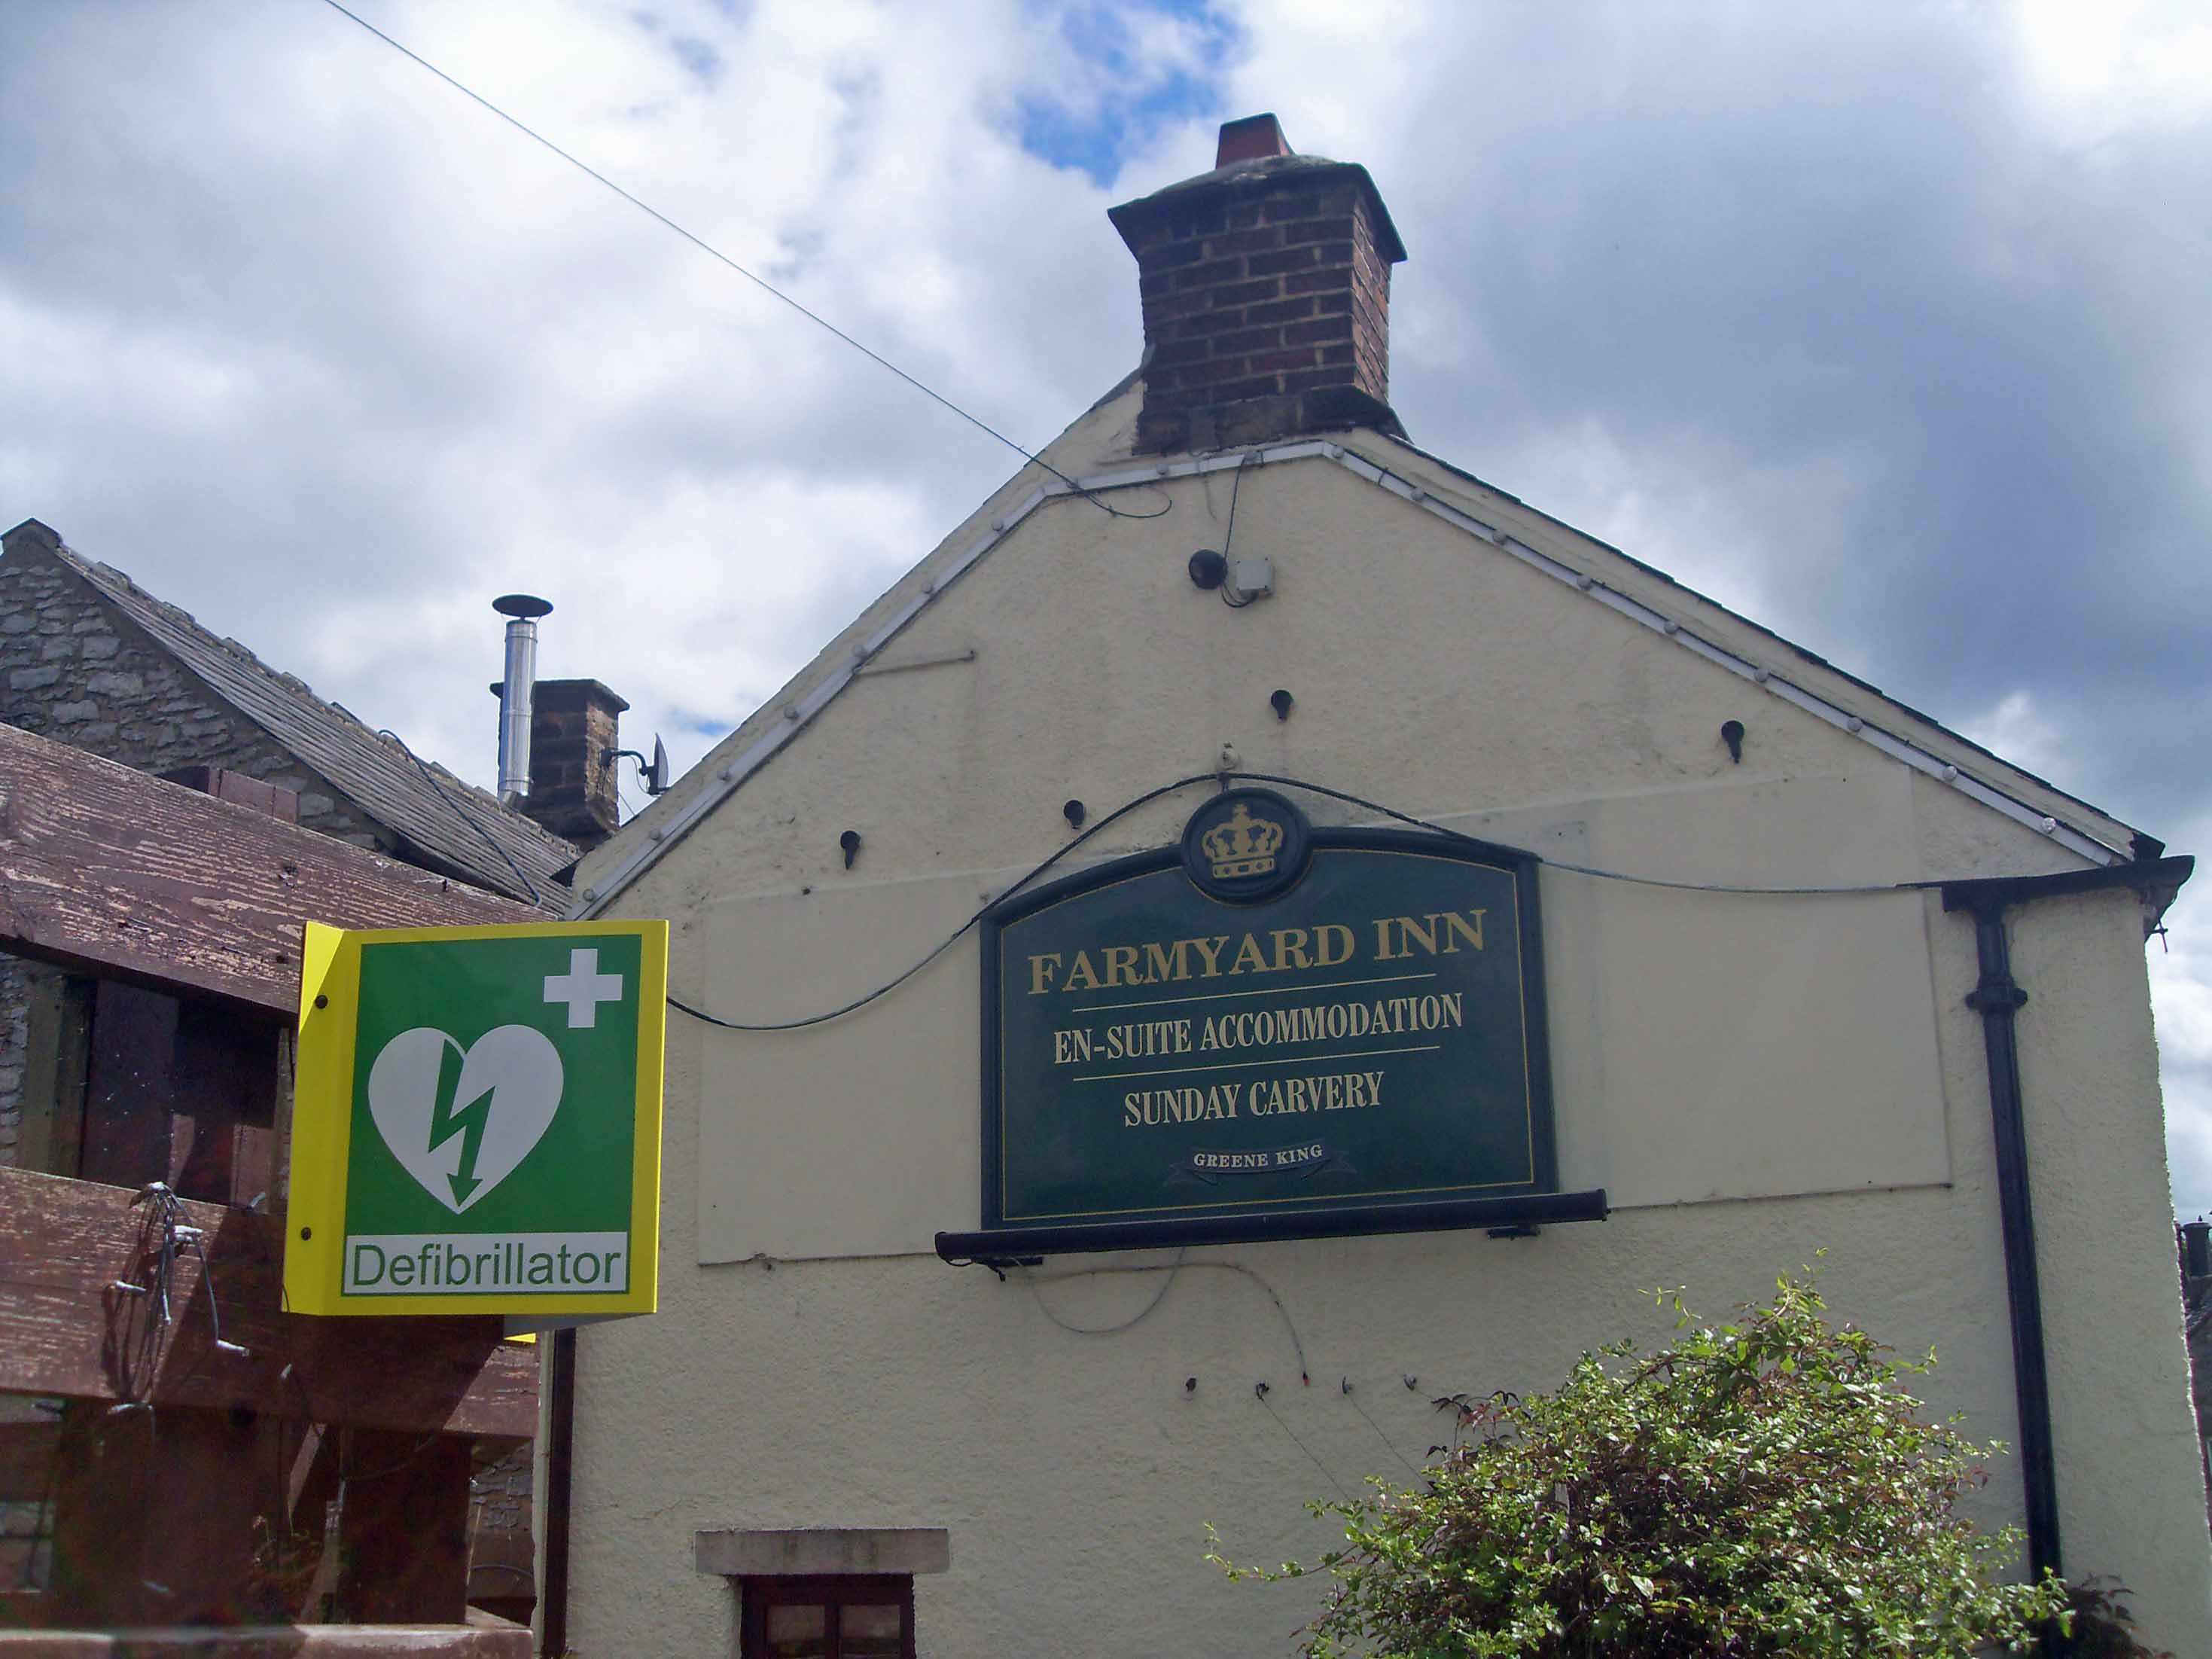 Farmyard Inn defibrillator